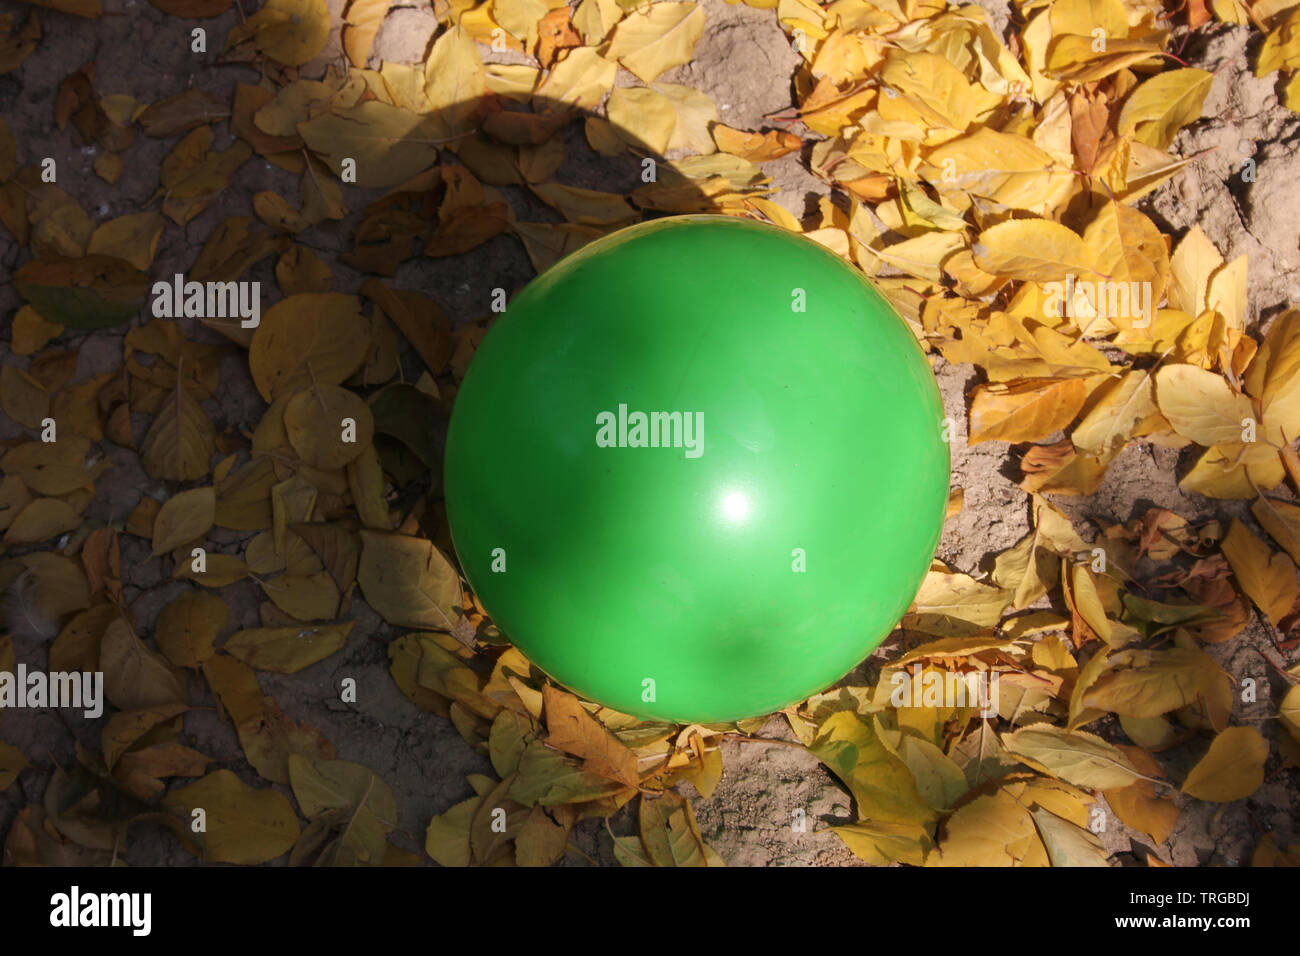 Green Ball - Stock Image